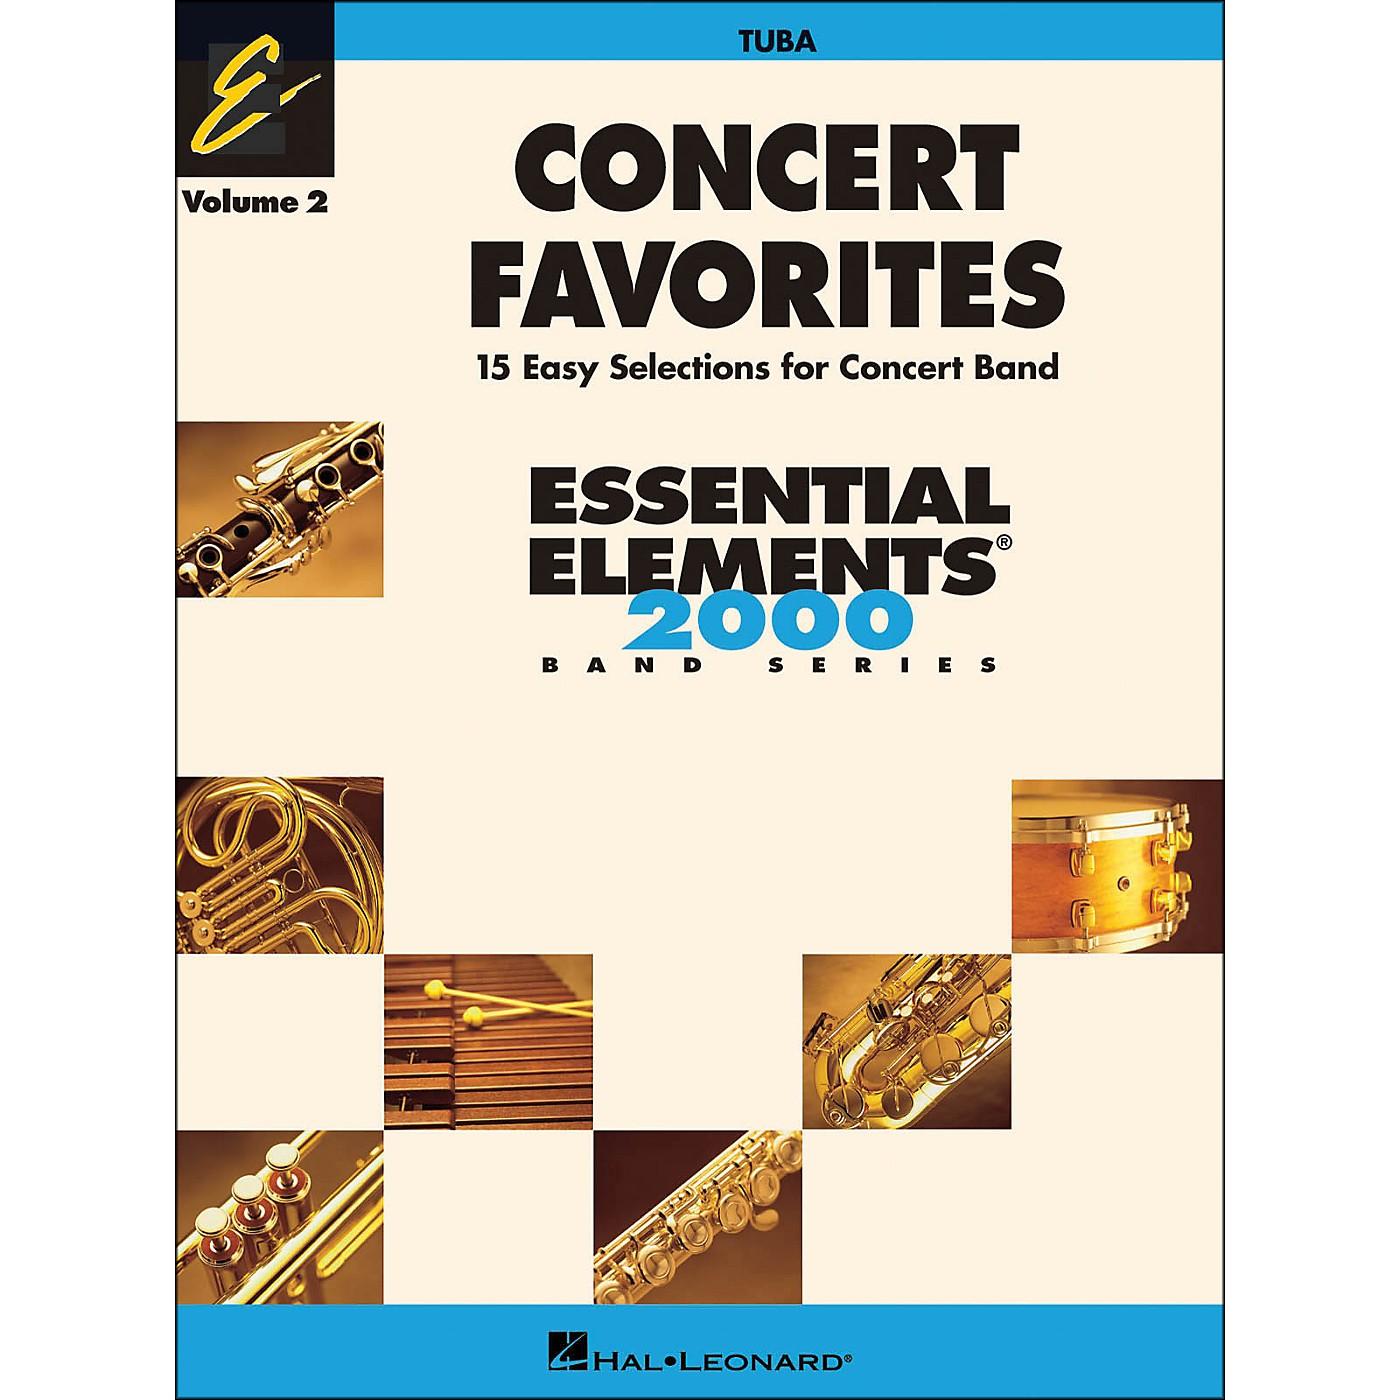 Hal Leonard Concert Favorites Volume 2 Tuba Essential Elements Band Series thumbnail